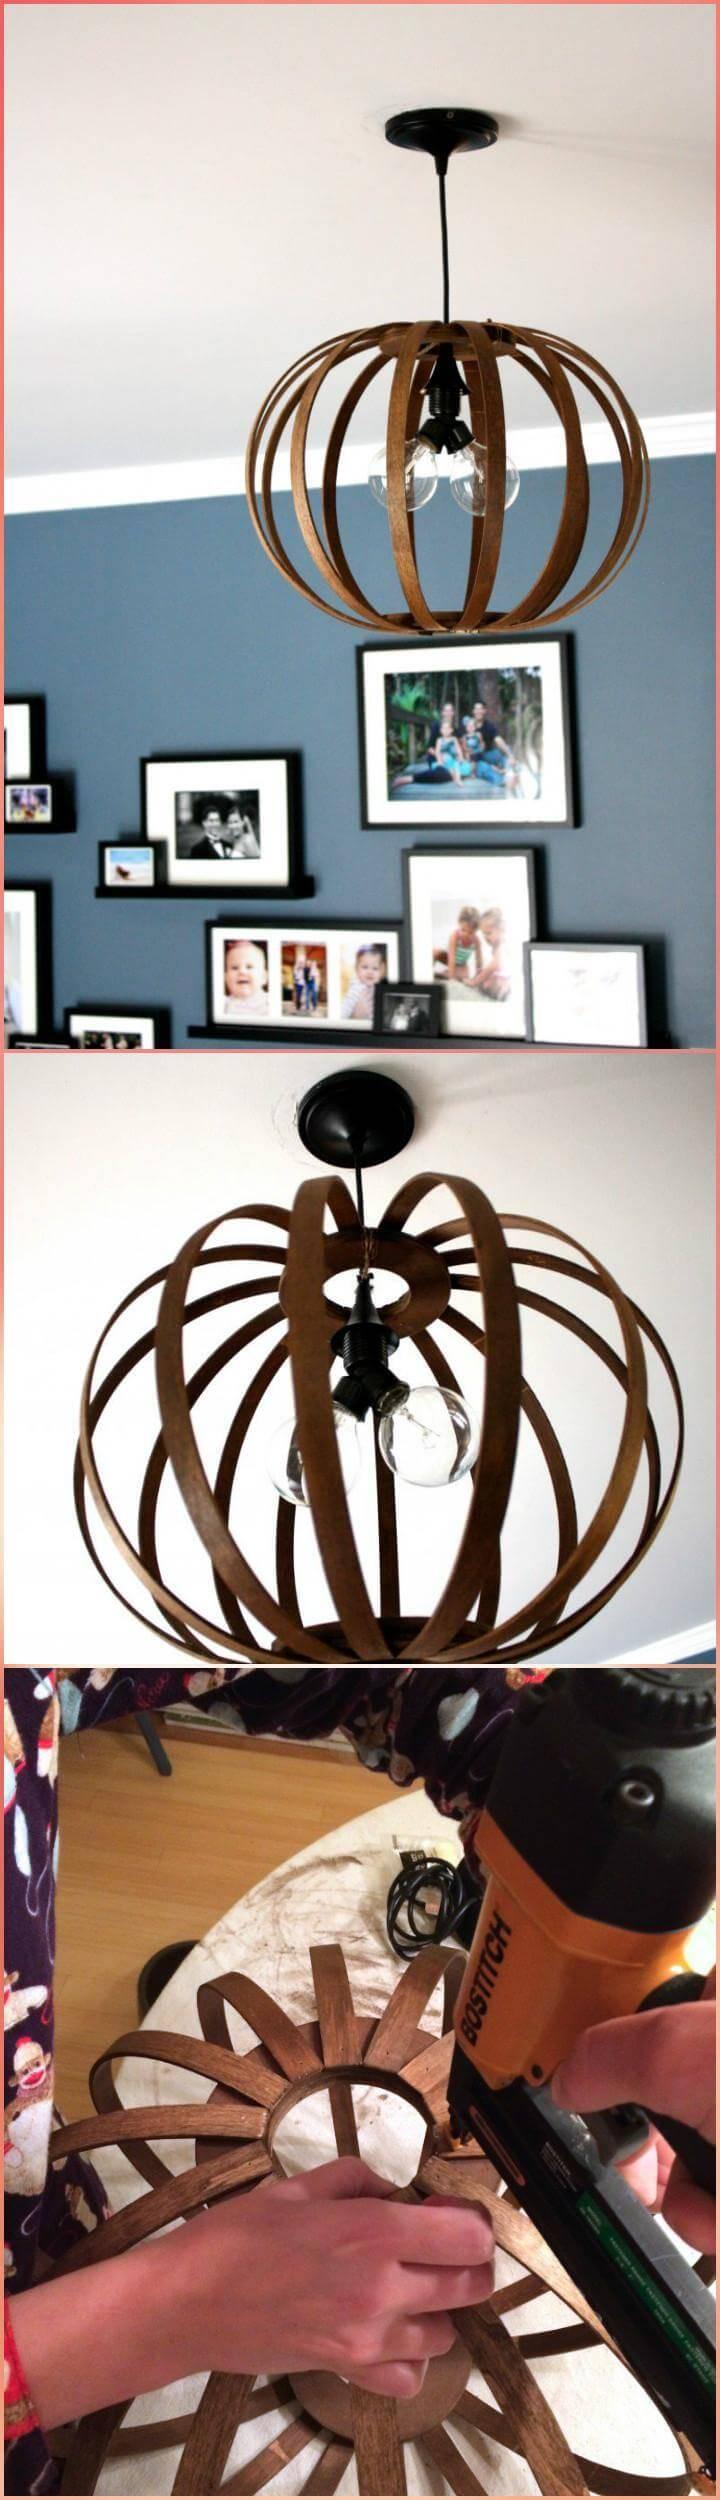 beautiful bentwood West Elm DIY pendant light